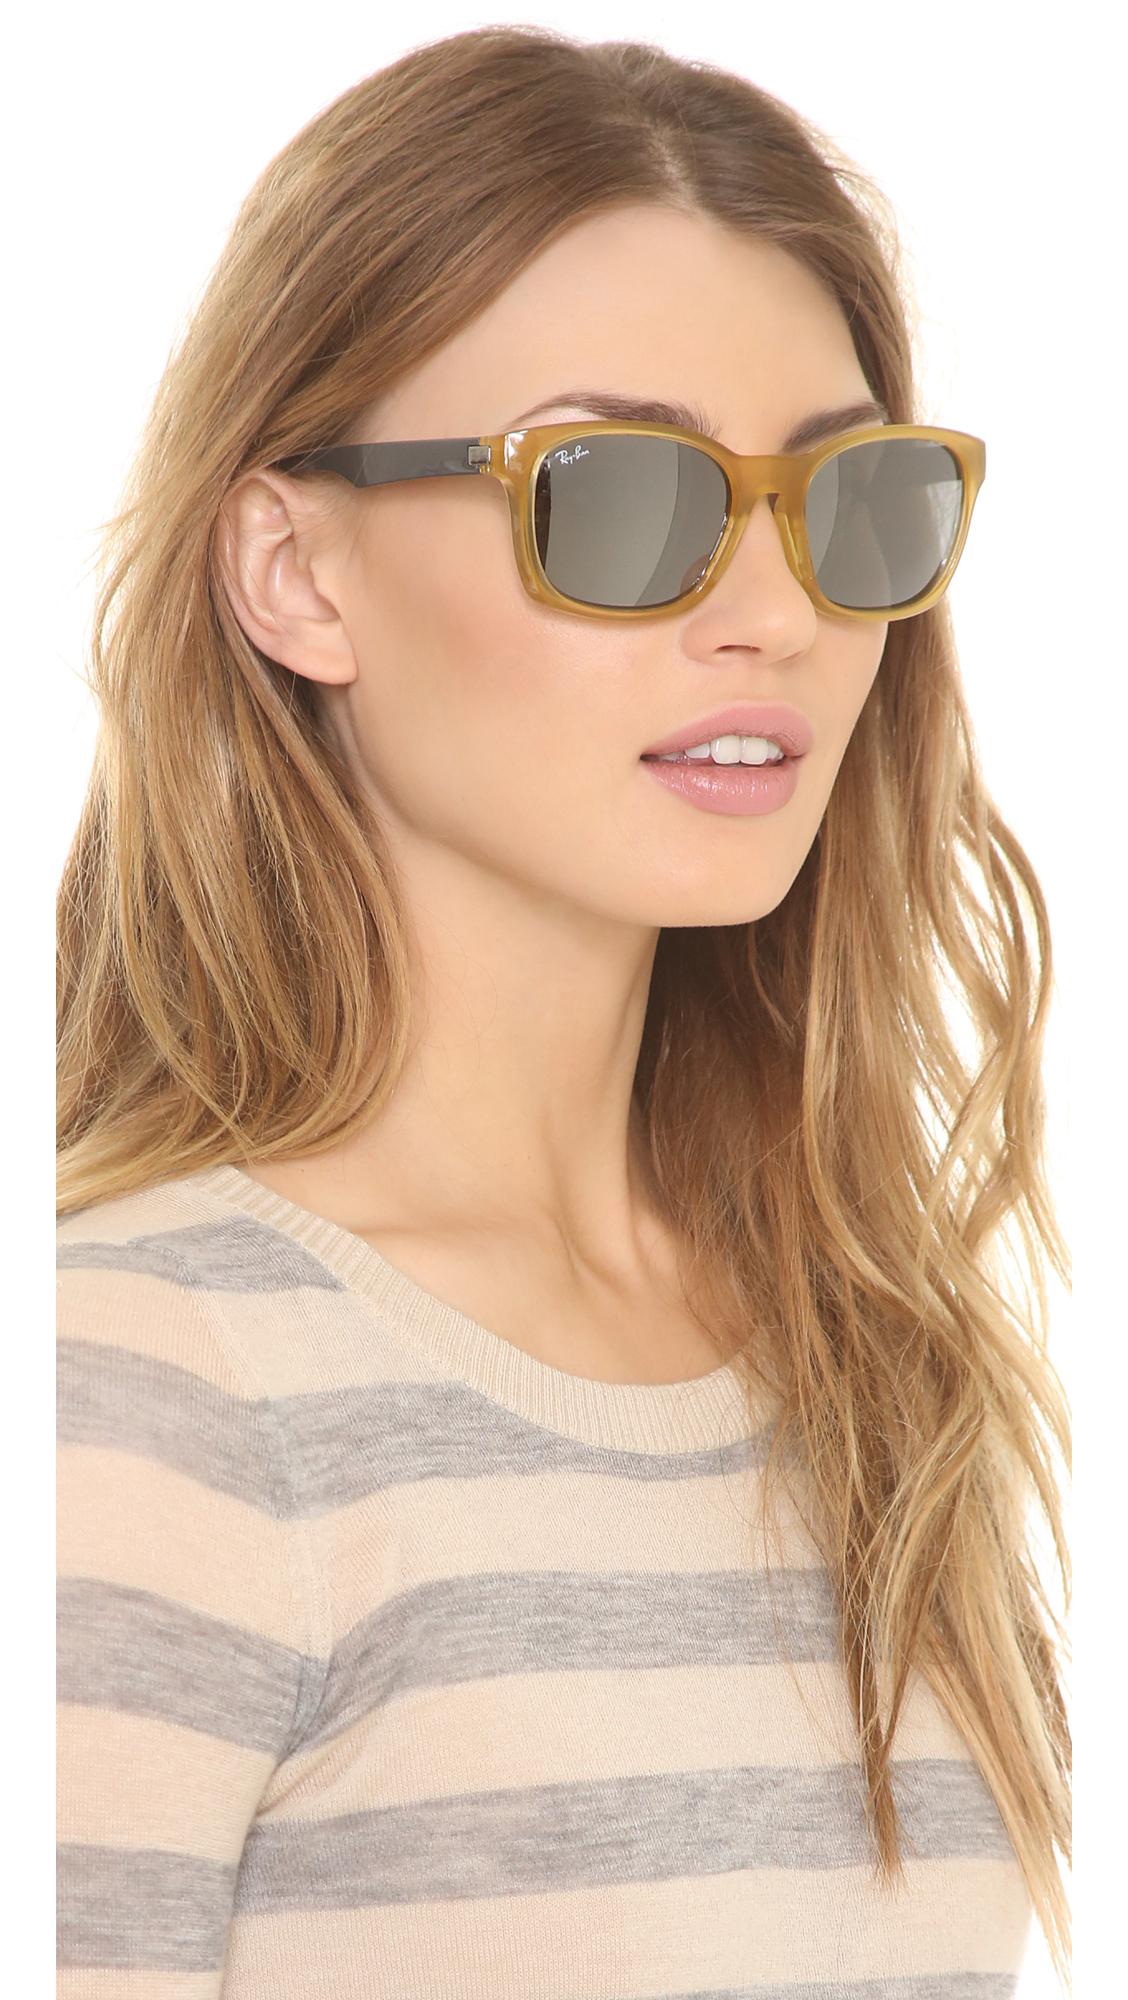 88adb3648a77b Lyst - Ray-Ban Oversized Square Sunglasses - Opal Yellow Silver ...